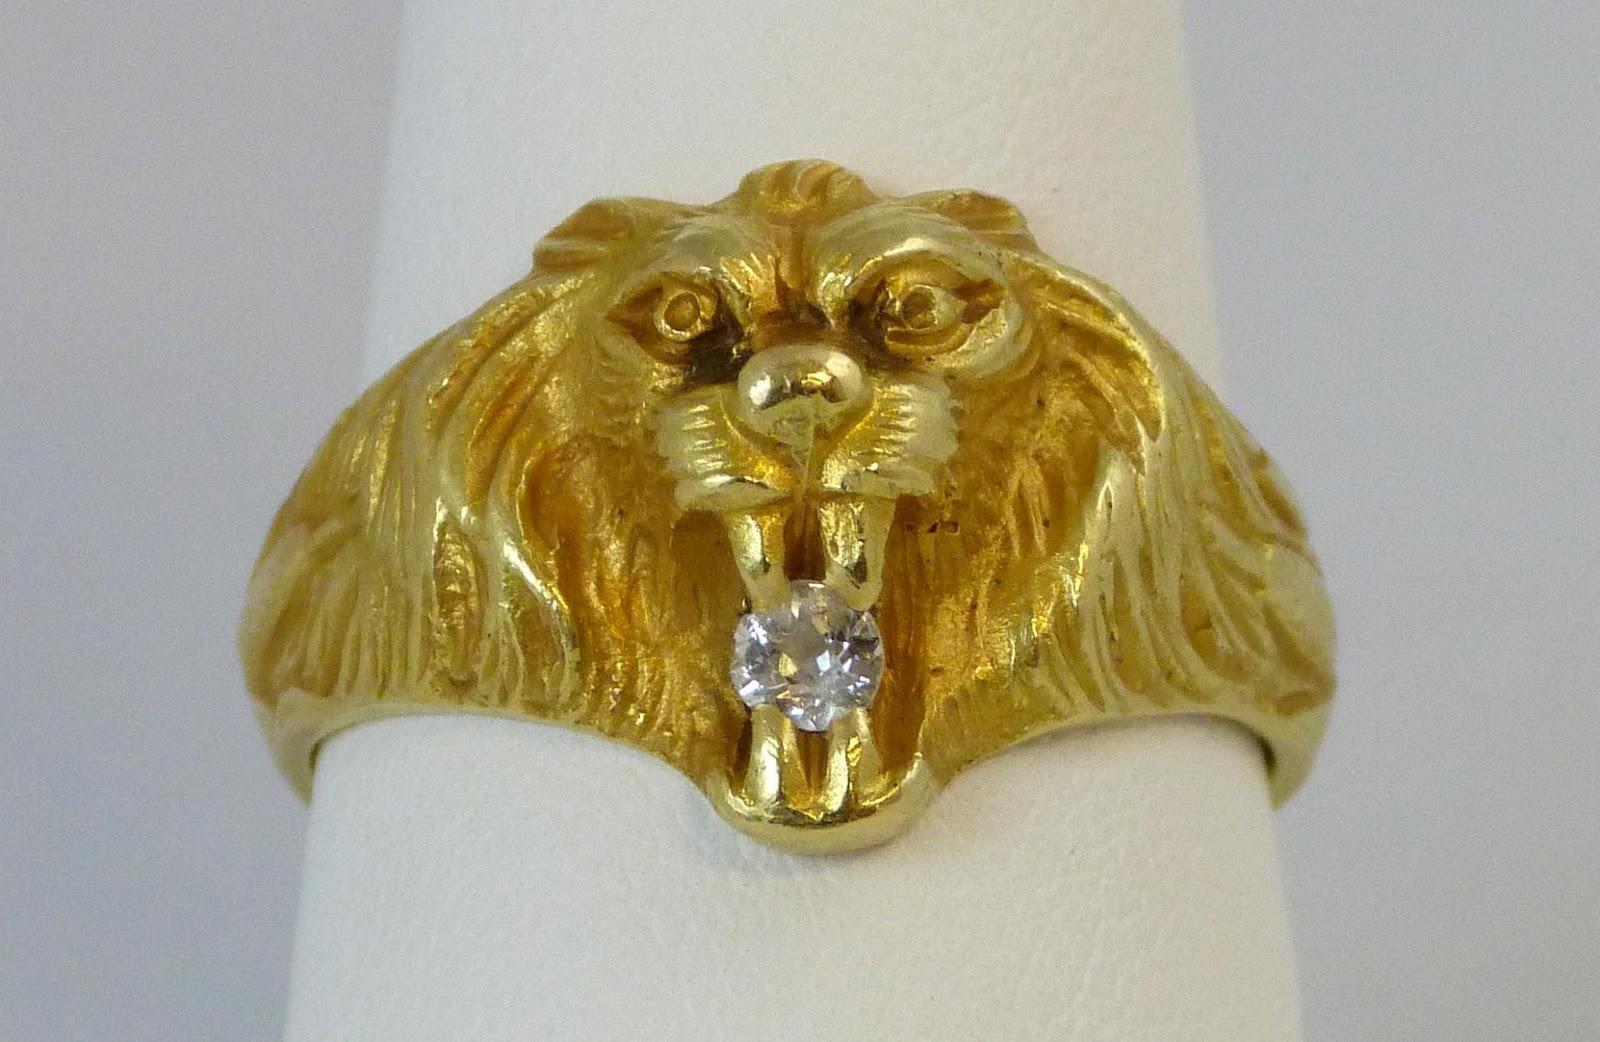 79 - 14K YELLOW GOLD LION HEAD